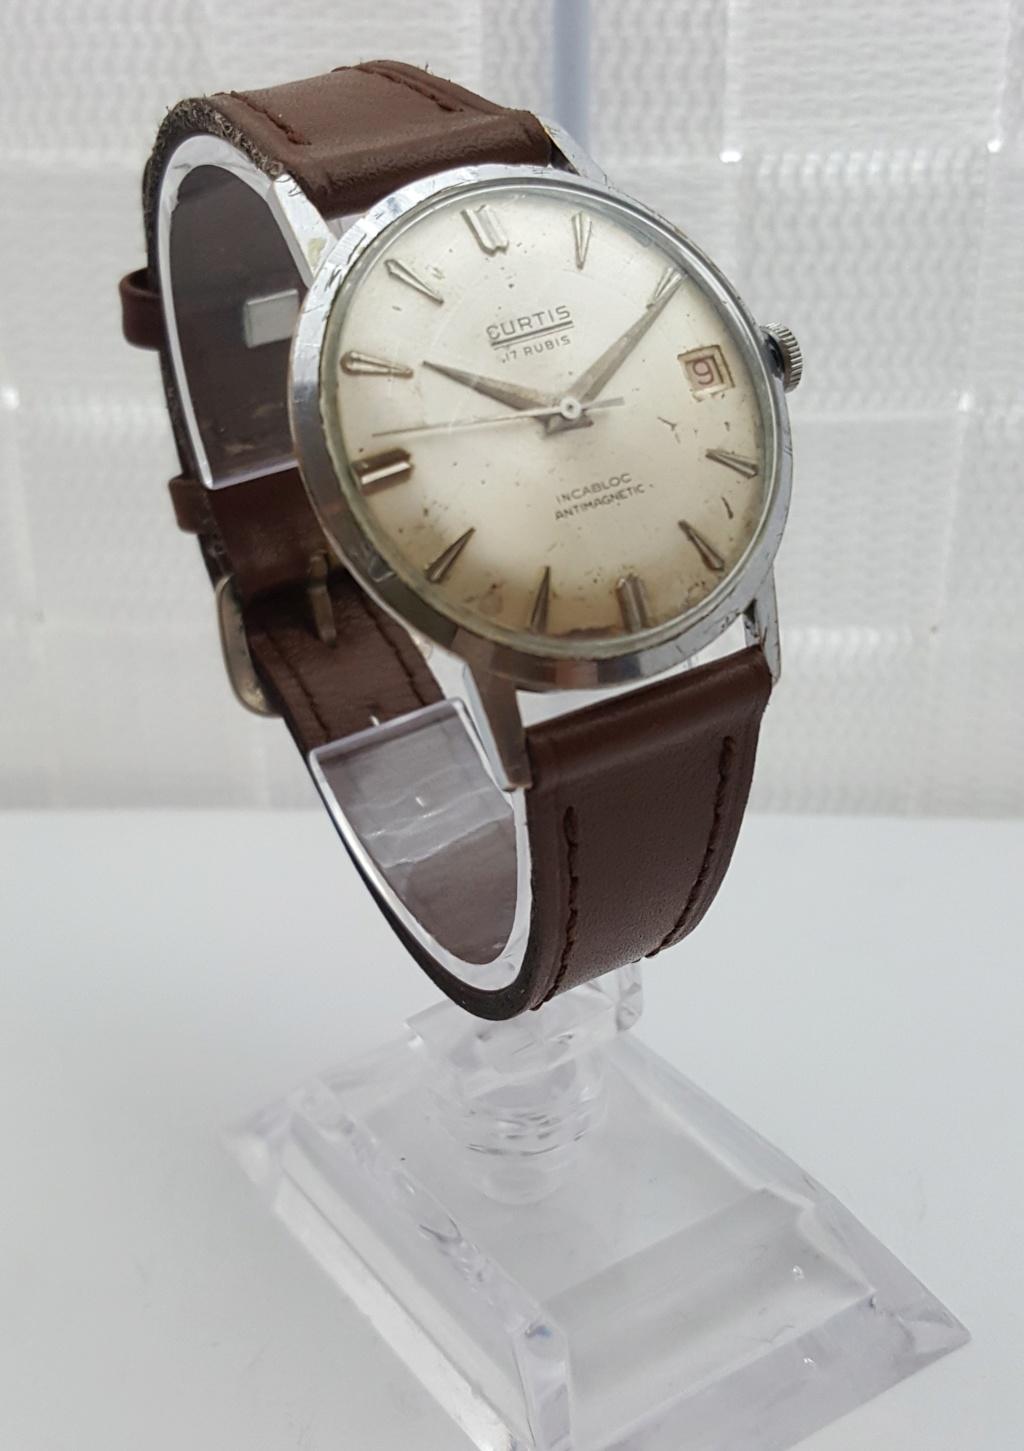 [Trocado] Relógio Vintage Curtis & Co. (Felsa 4017) 17J - 34 mm 0028